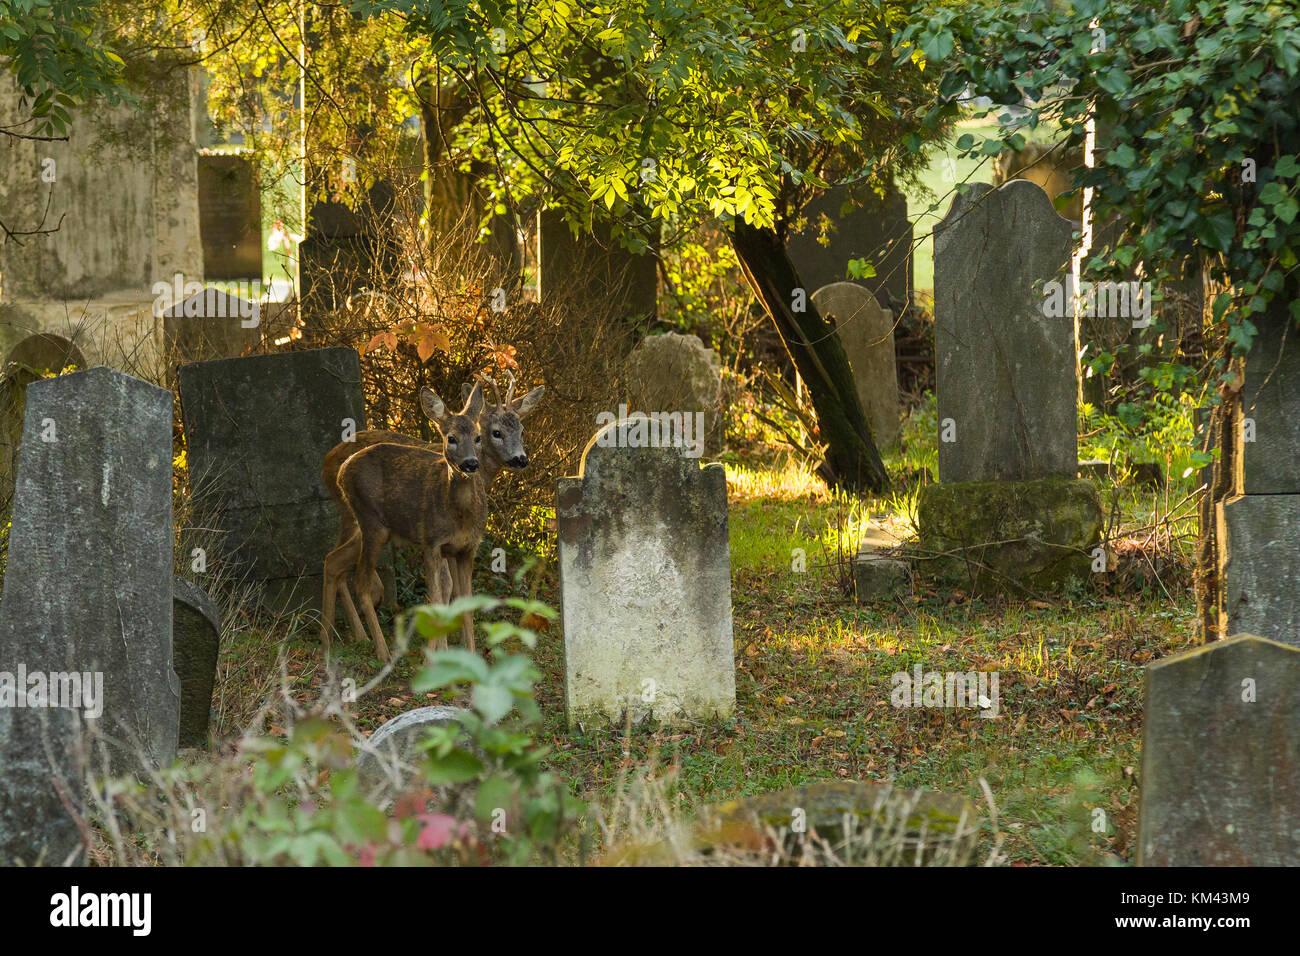 Rotwild auf Friedhof Stockbild